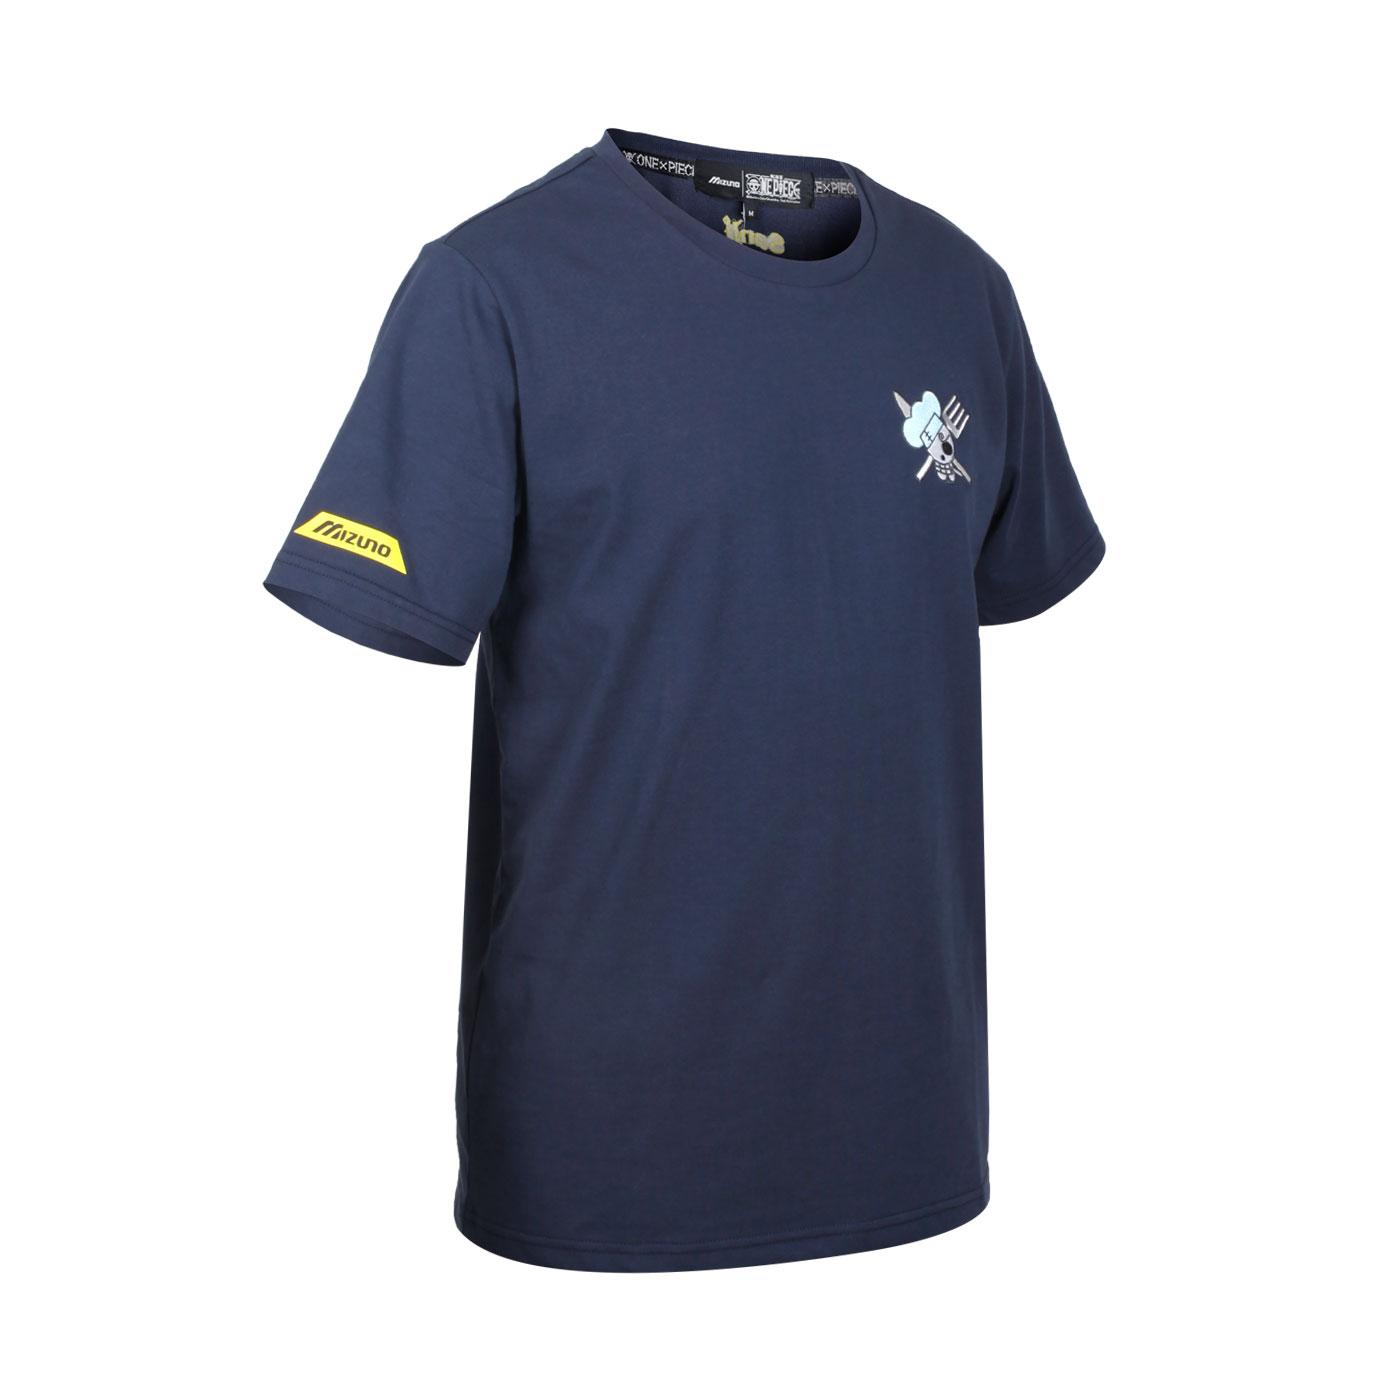 MIZUNO 特定-男款短袖T恤-香吉士款(海賊王聯名款) D2TA150914 - 丈青白藍